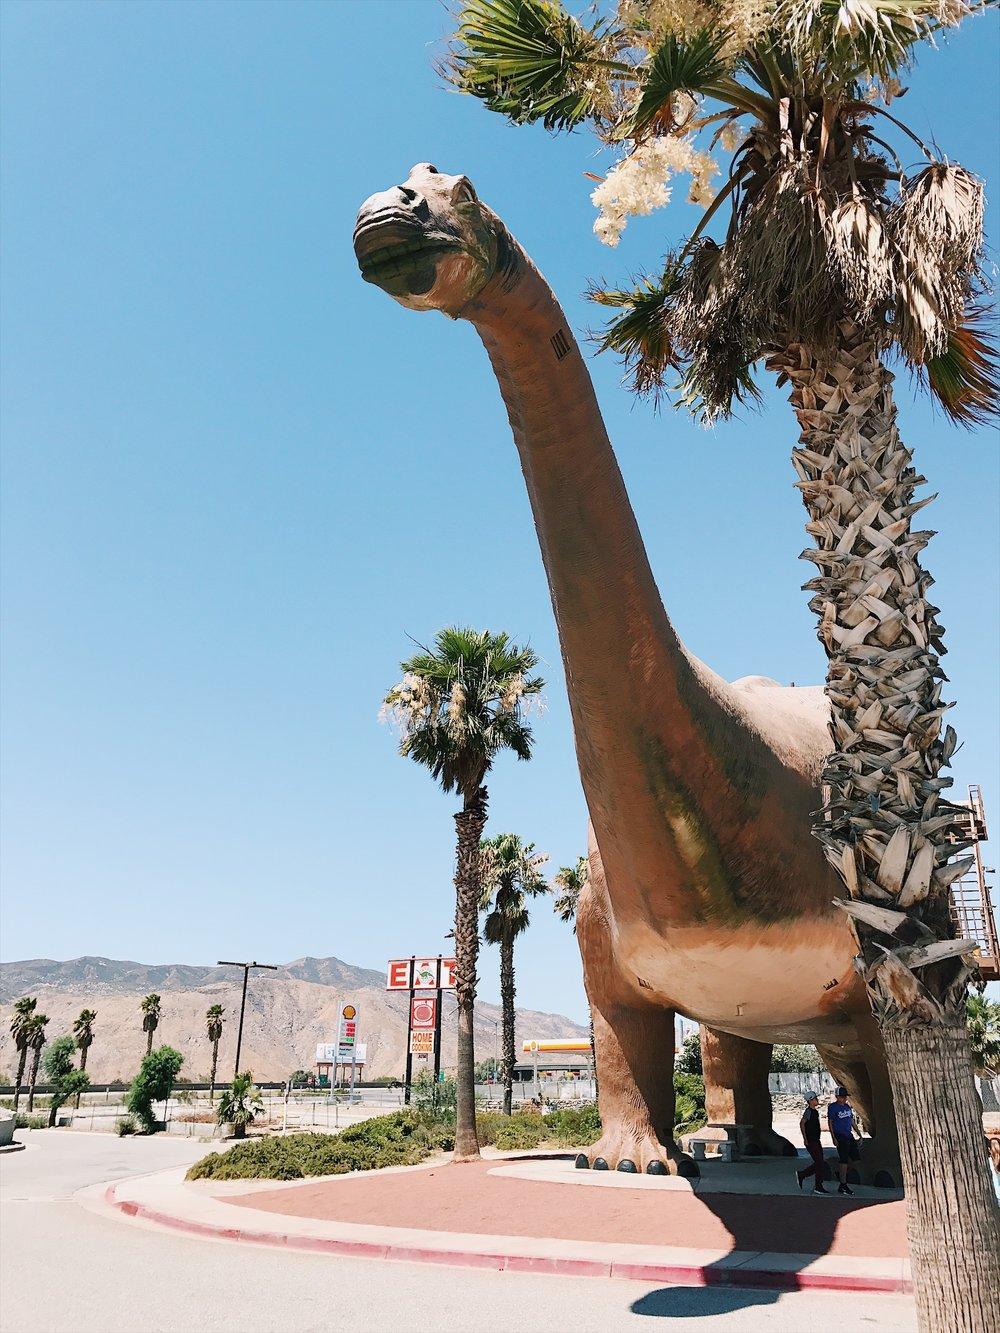 Cabazon Dinosaurs | Cabazon, CA